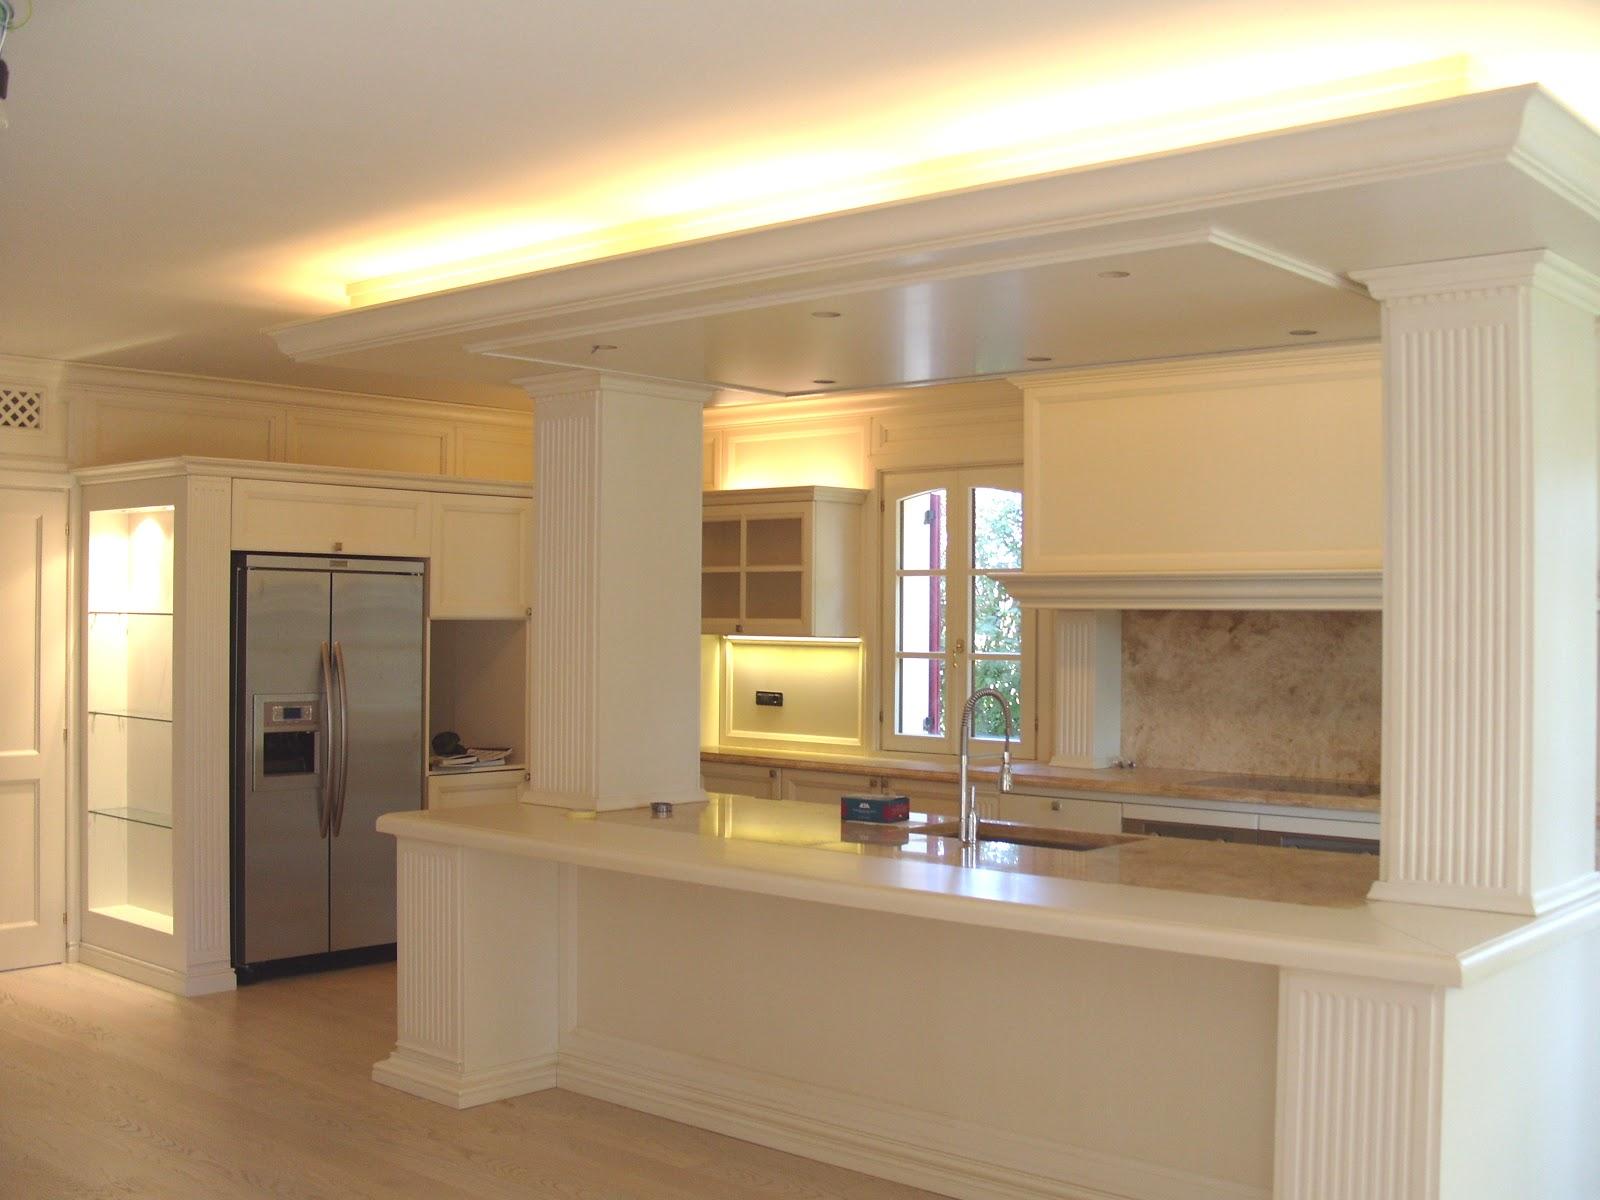 Mobili su misura arredamenti su misura di qualit cucine - Cucine componibili bianche ...